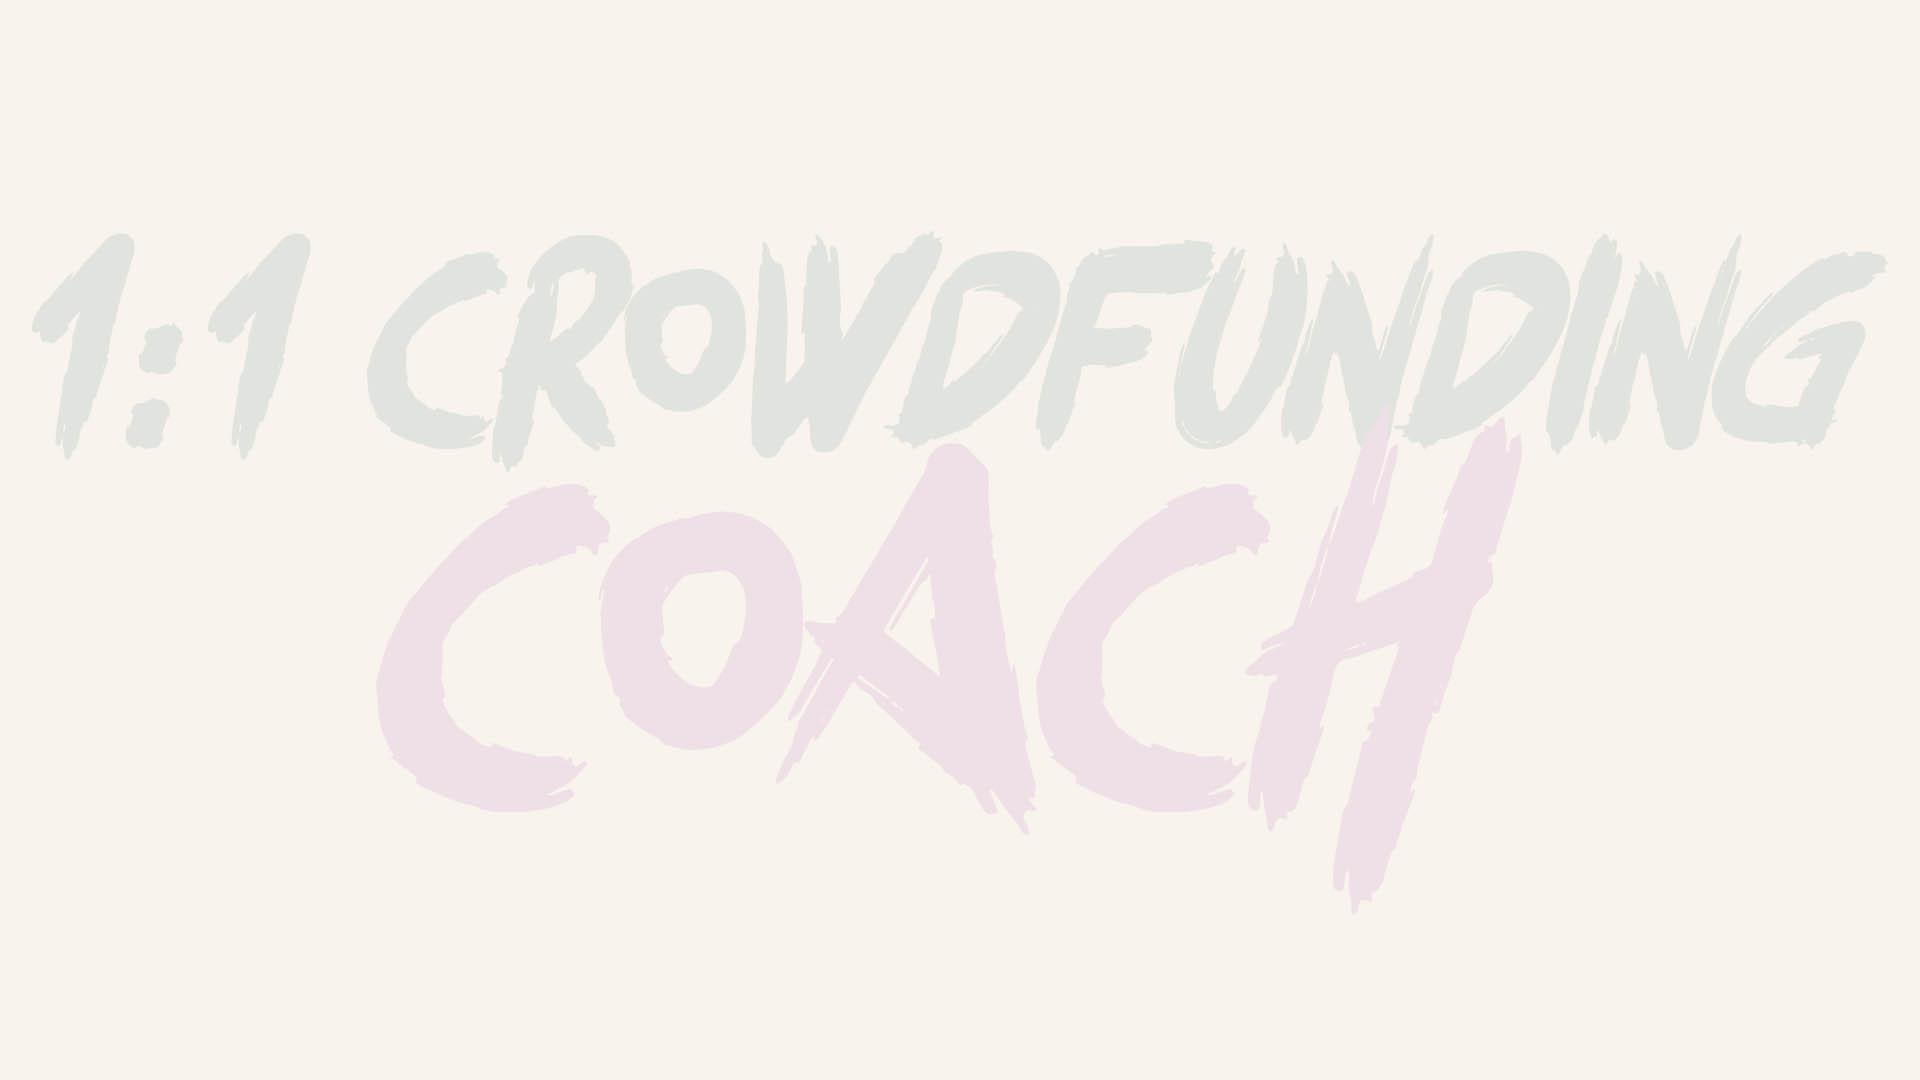 1:1 Crowdfunding Coach - Tommaso De Benetti